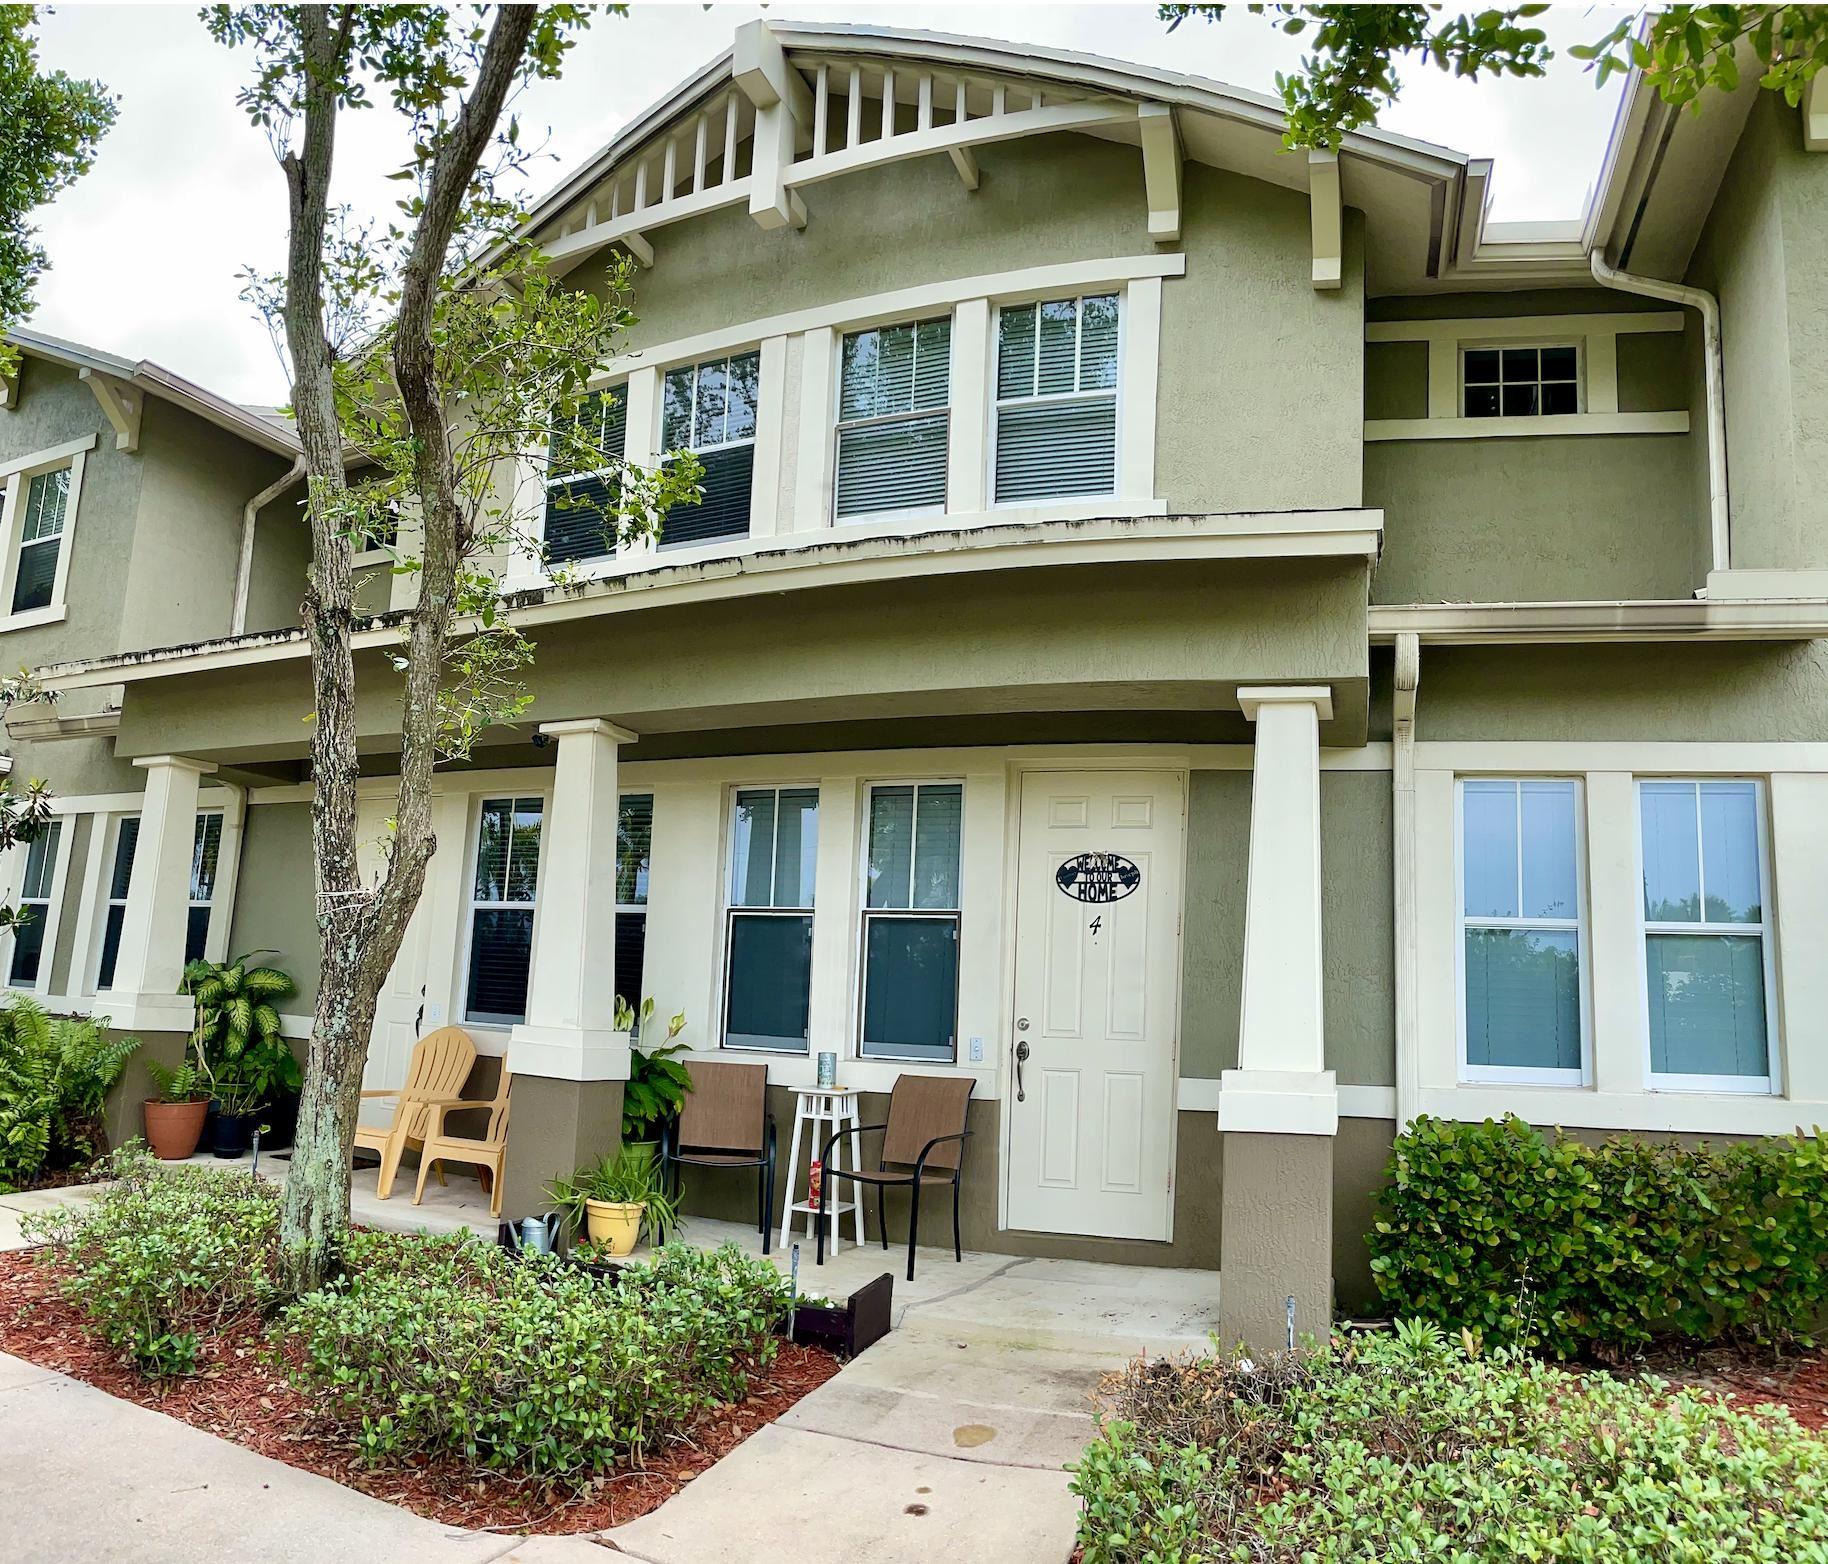 990 Millbrae Court #4, West Palm Beach, FL 33401 - MLS#: RX-10724683